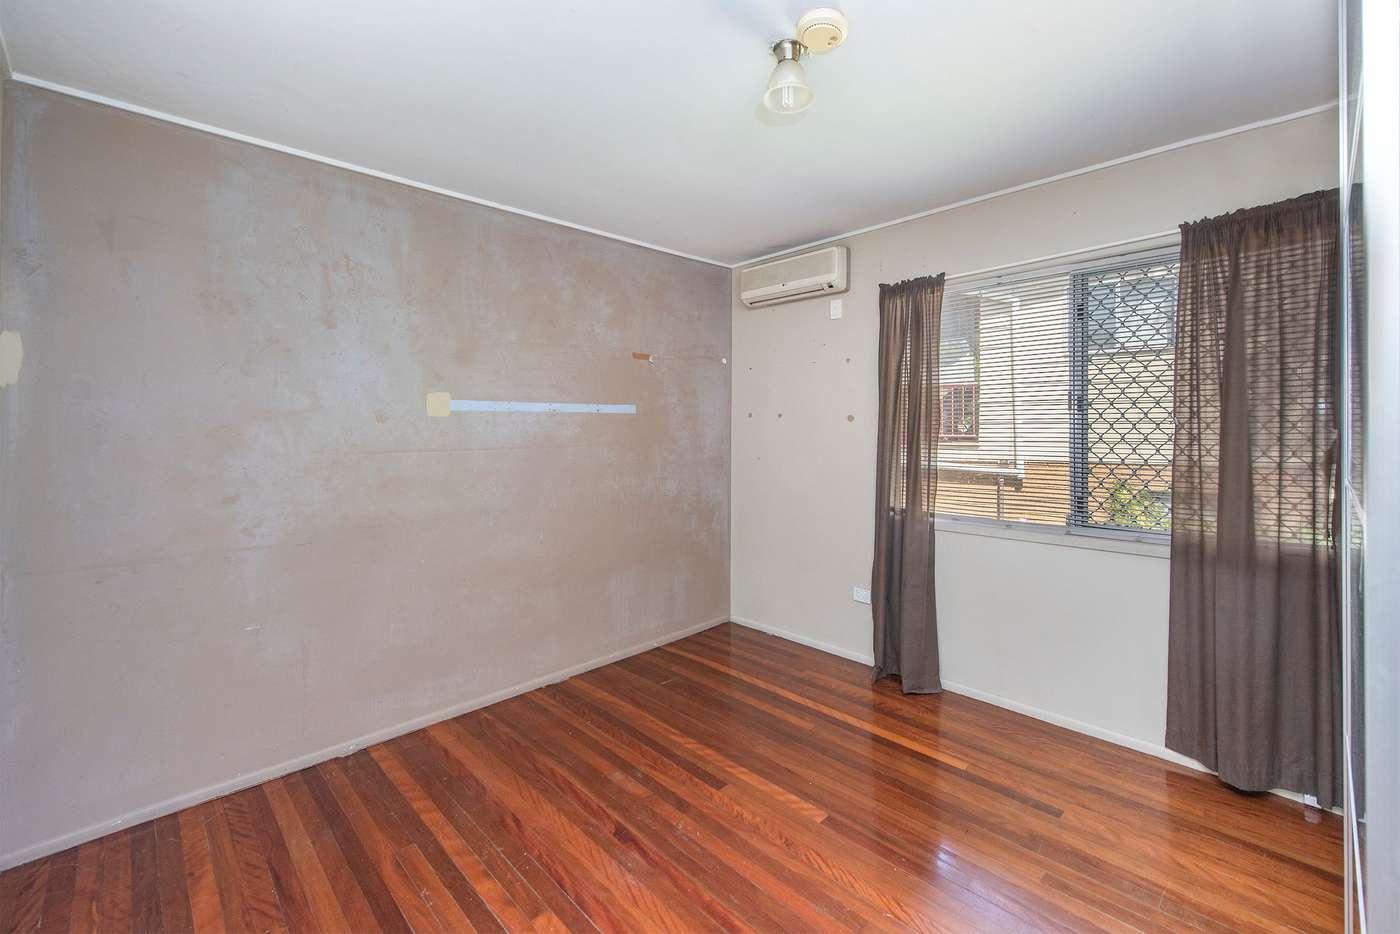 Sixth view of Homely house listing, 3 Balmoral Street, Slacks Creek QLD 4127